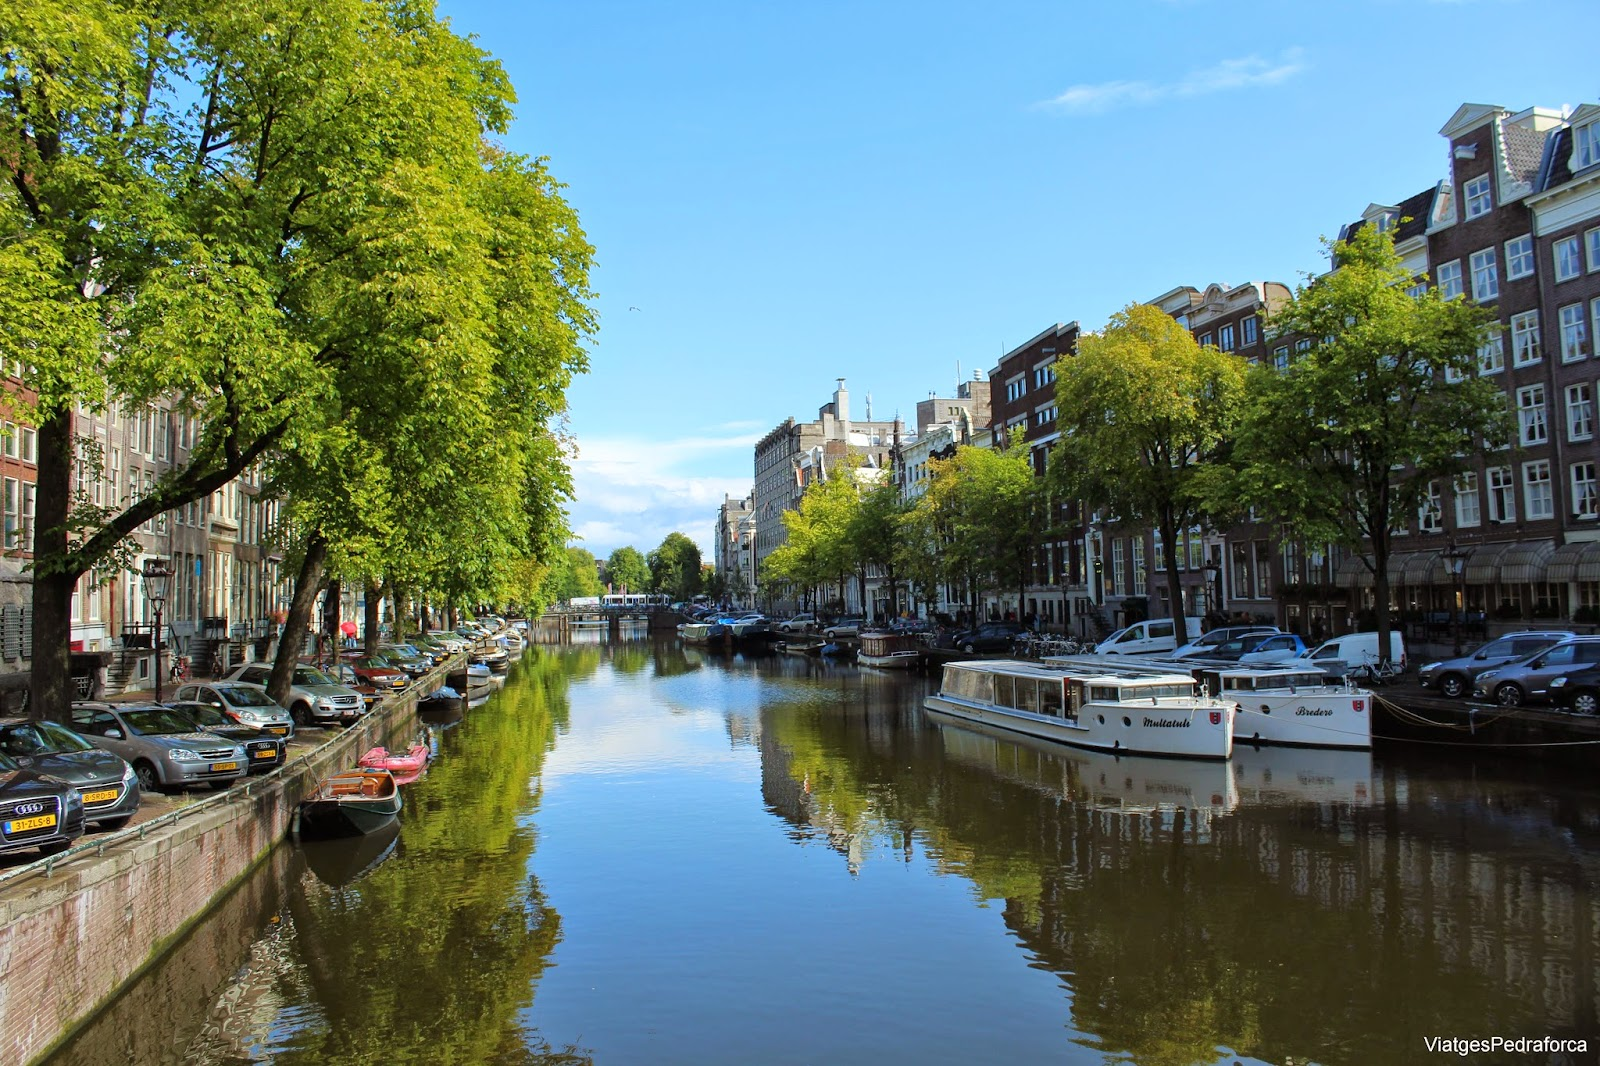 Canal Single Amsterdam Holanda Països Baixos